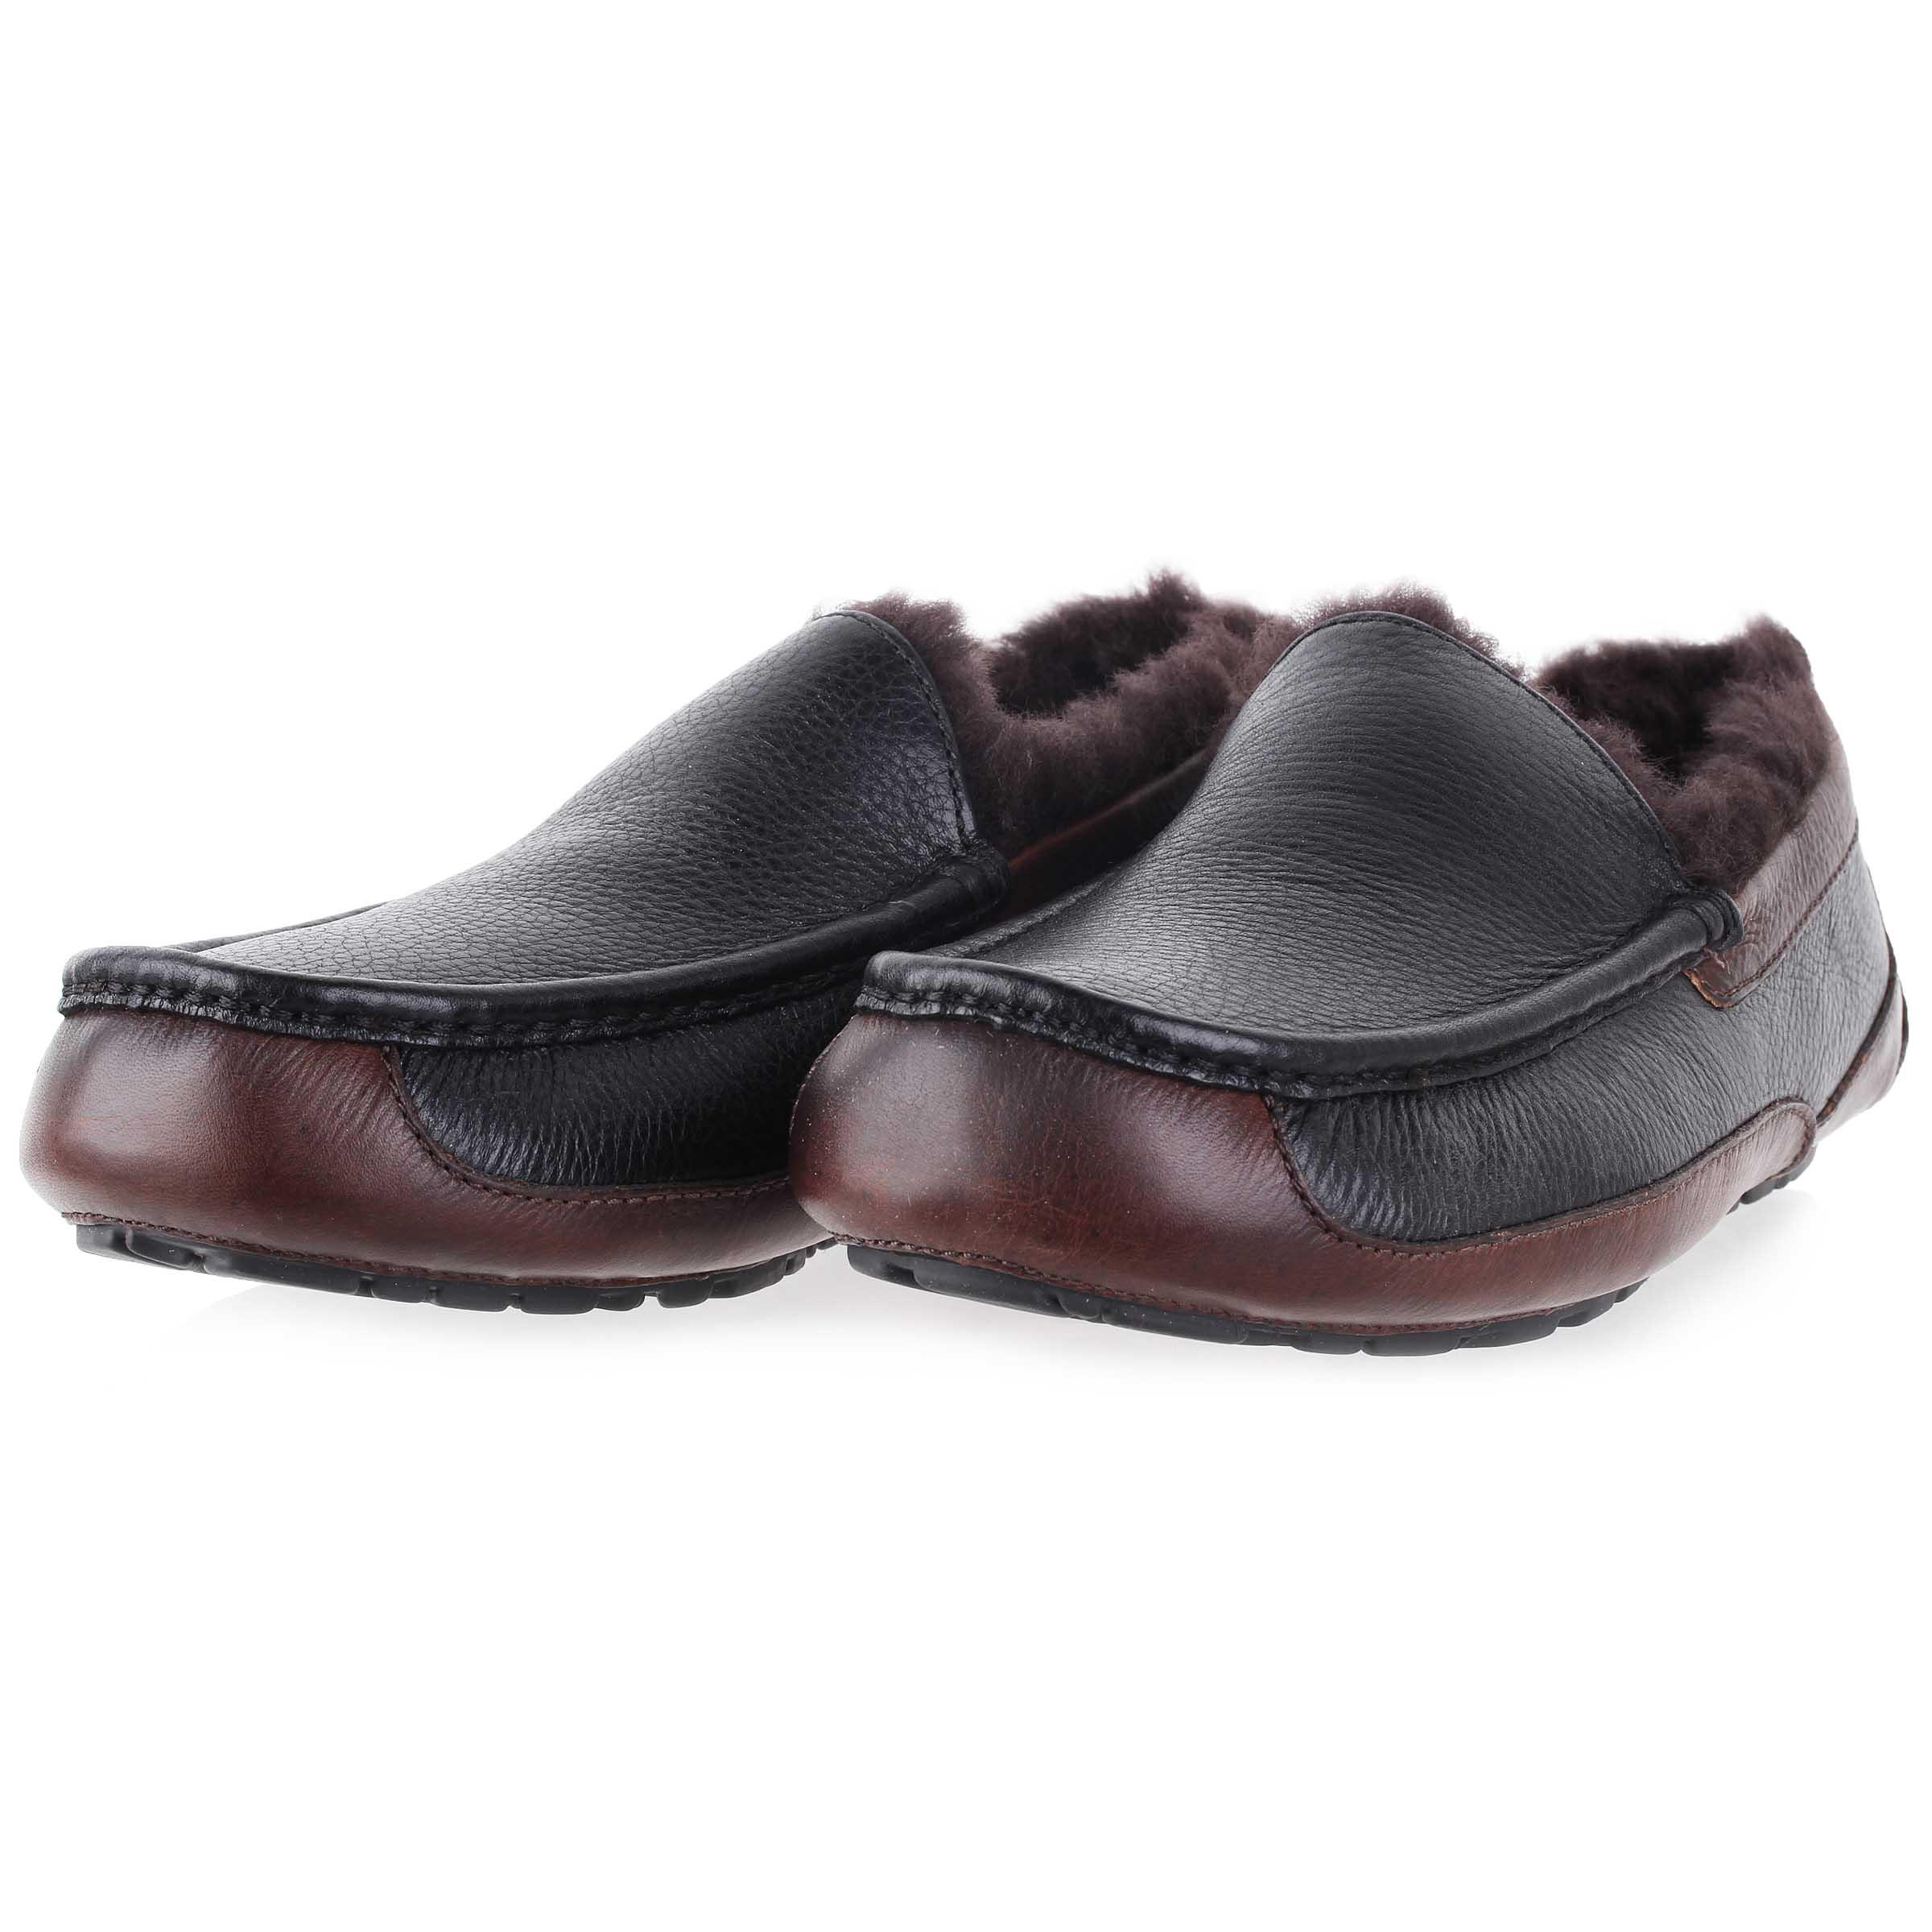 fa00fc4355 UGG Men s Ascot Slippers 1005229 BCNT Black Shoes